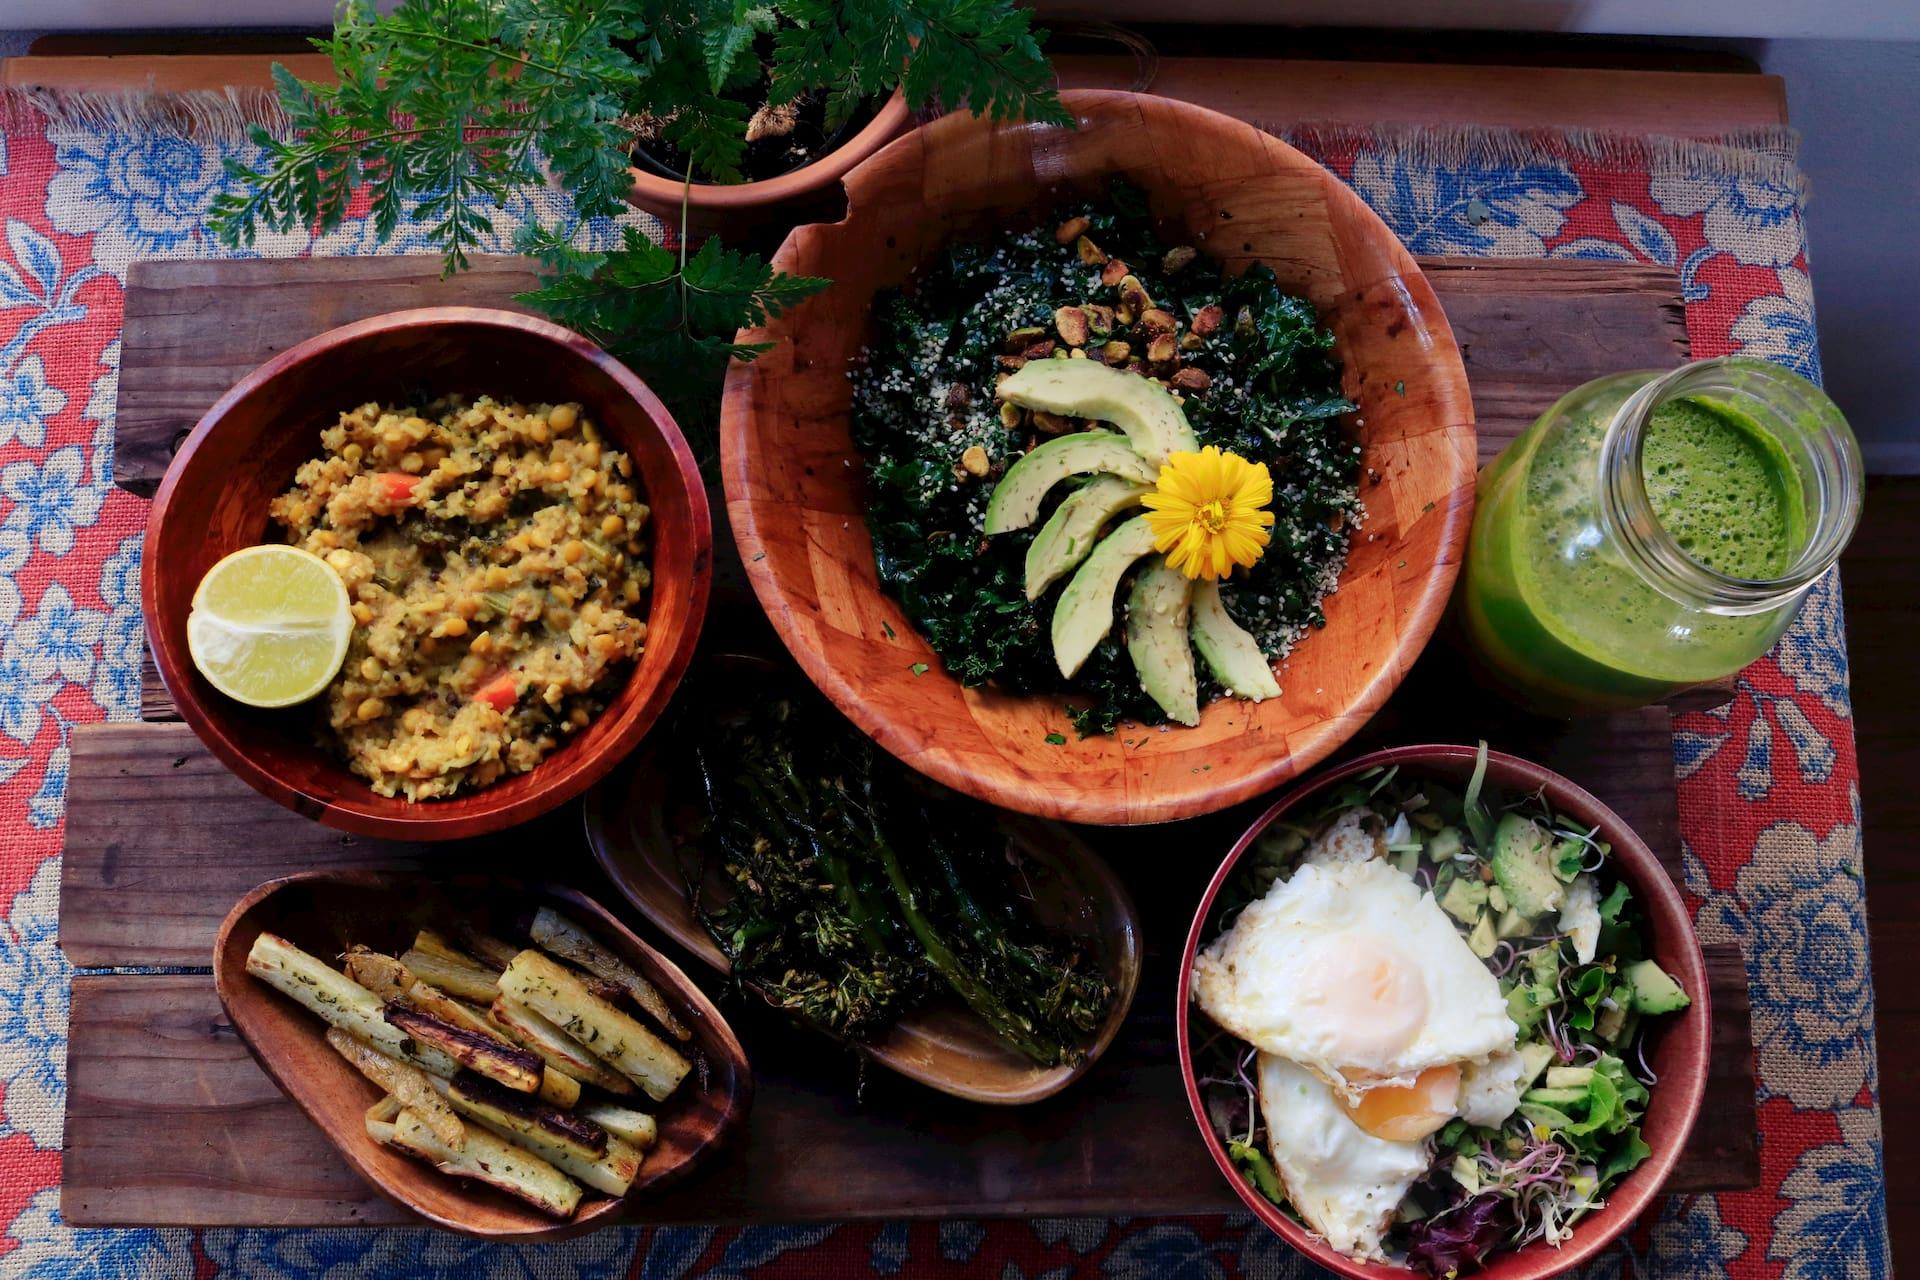 adventour - India - Kerala food cooking